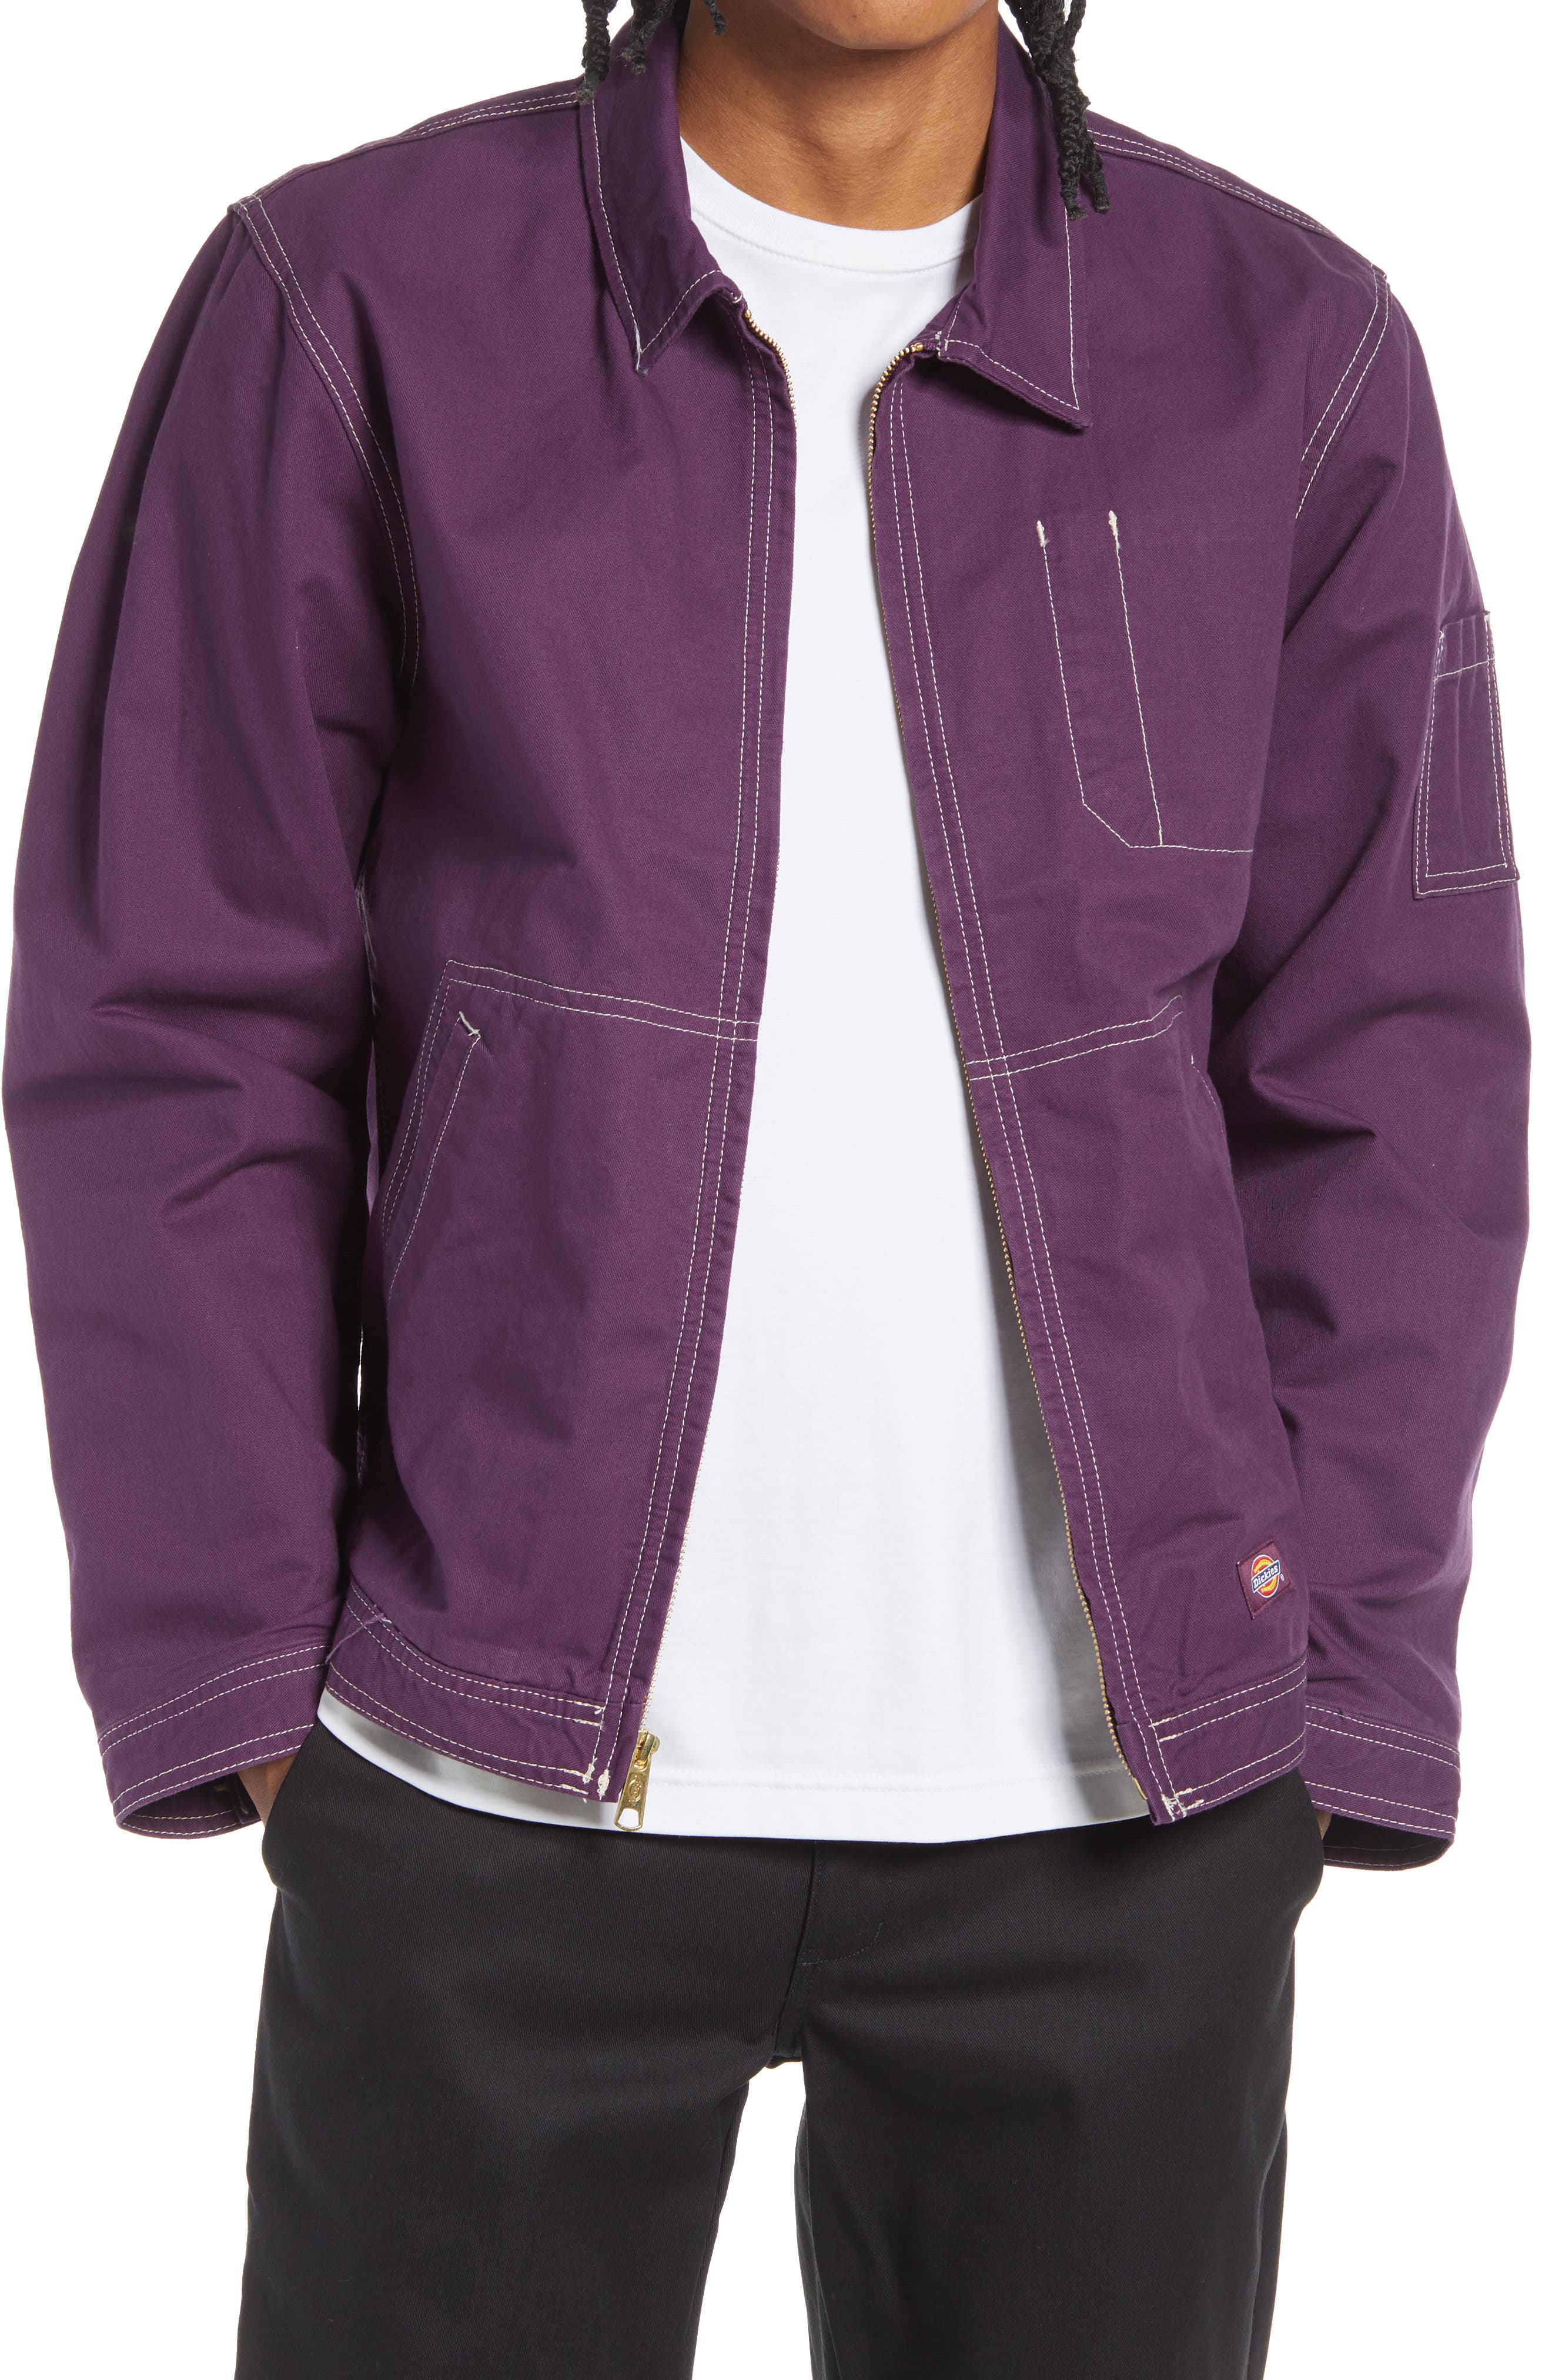 R2R Eisenhower Utility Jacket